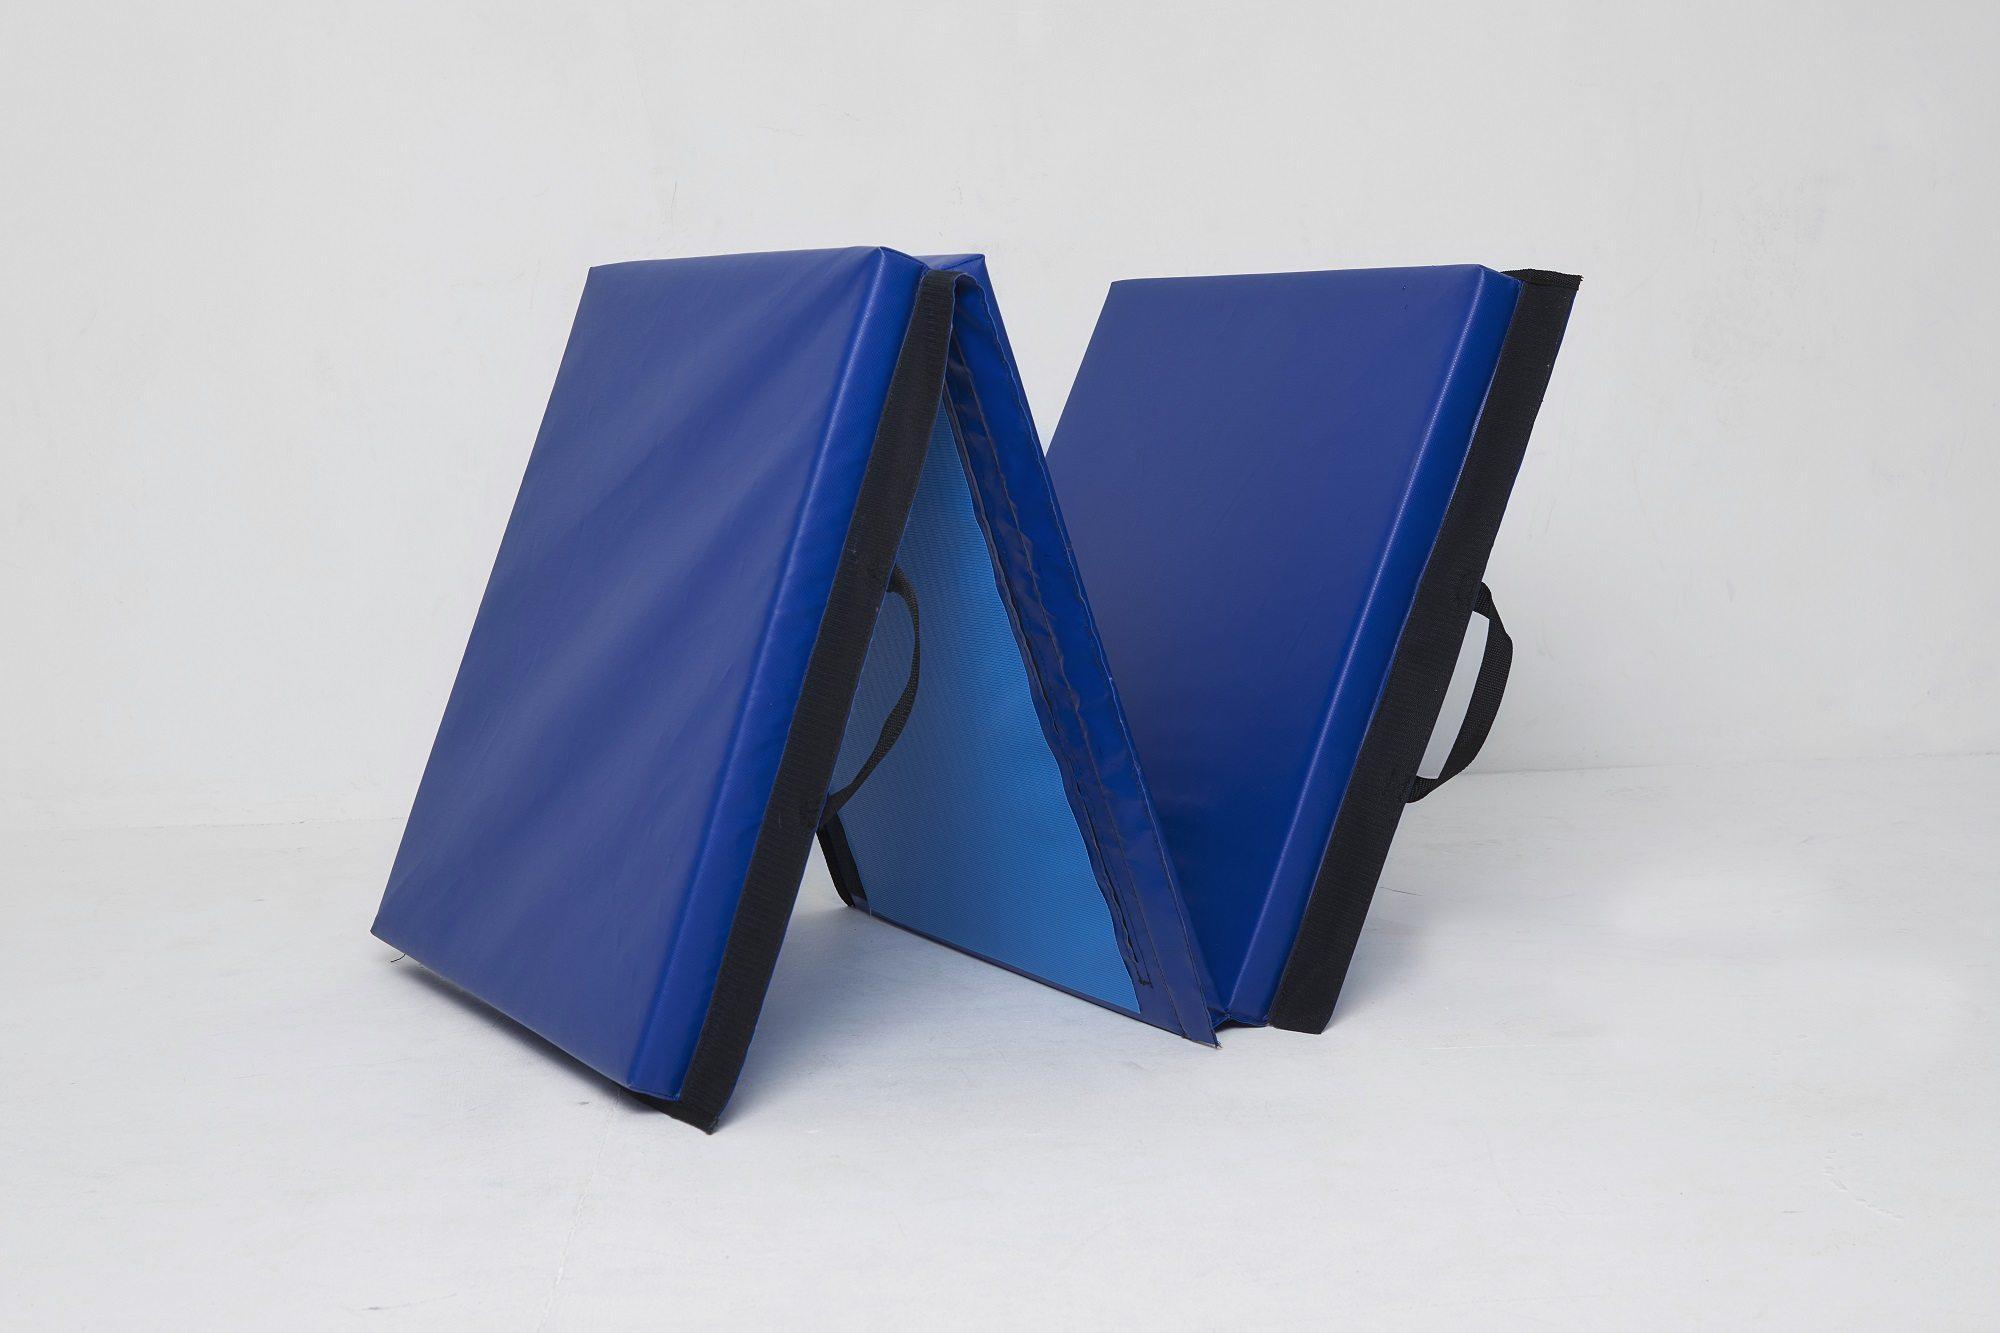 promat foldable gymnastics mat